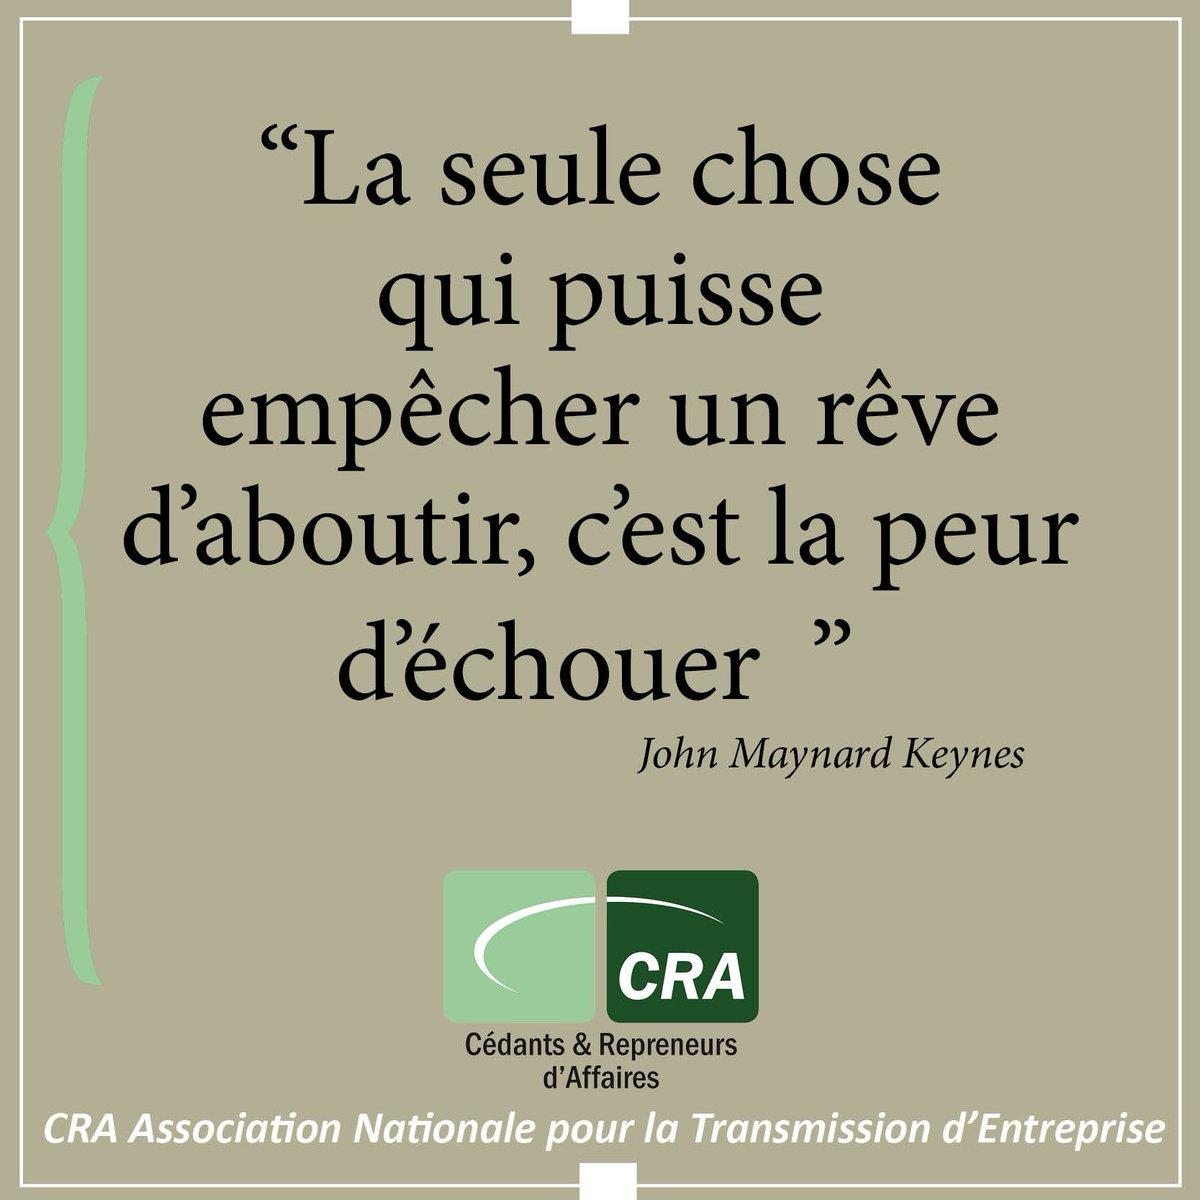 Cra على تويتر Citation Entrepreneur Entrepreneuriat